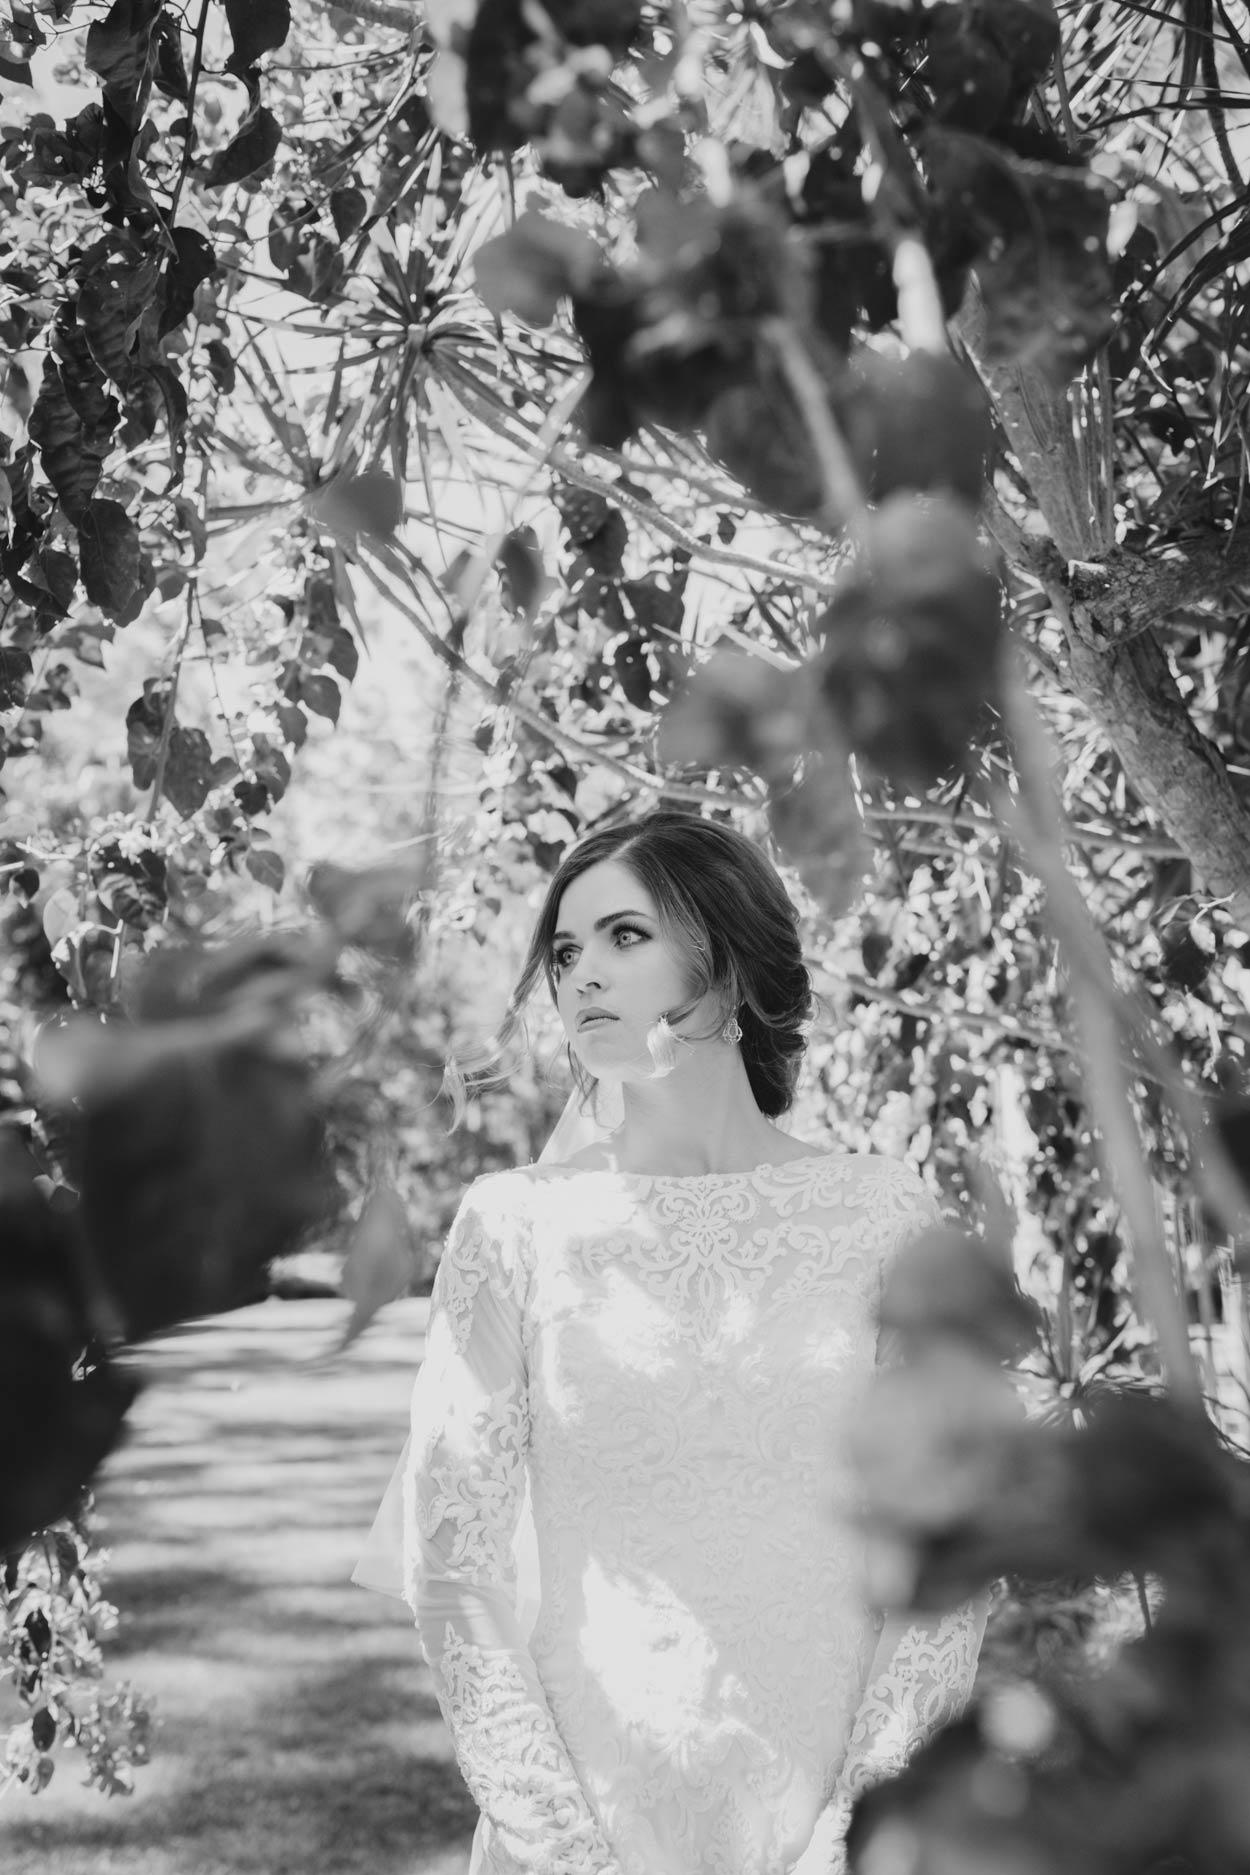 Candid Byron Bay & Bangalow Pre Destination Wedding Photographer - Brisbane, Queensland, Australian